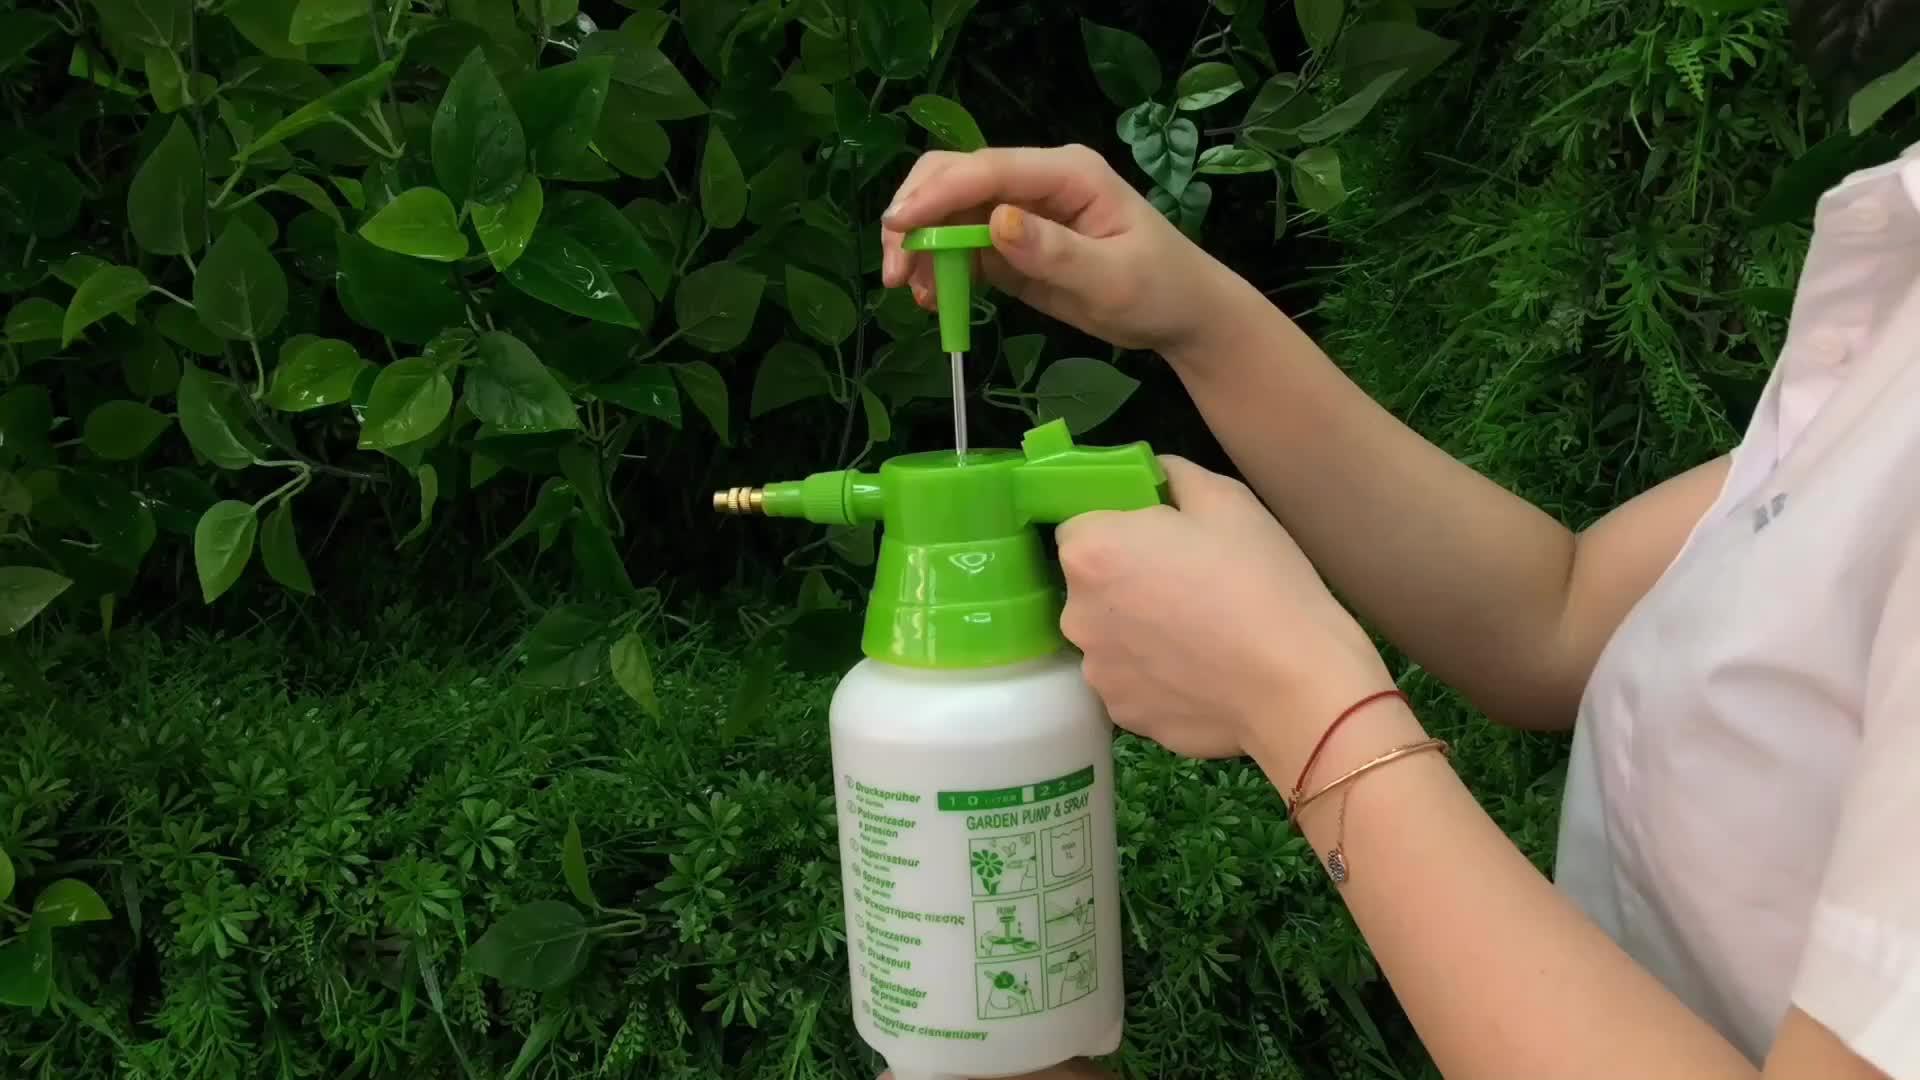 Seesa hot sale garden portable plastic hand pump sprayer 1l With brass nozzle